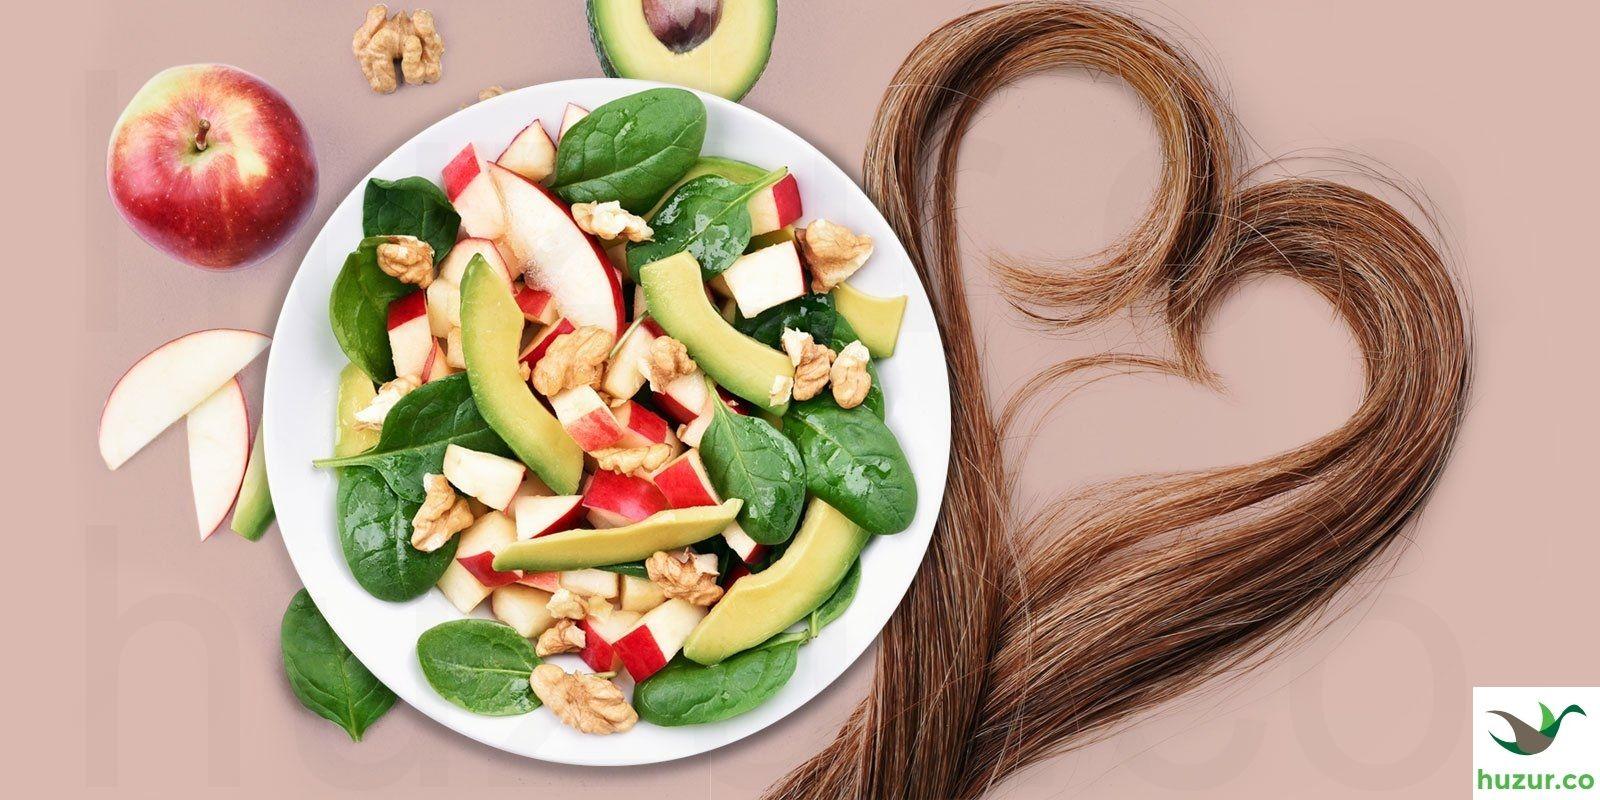 Healthy Food Egypt Healthy Recipes Healthy Food